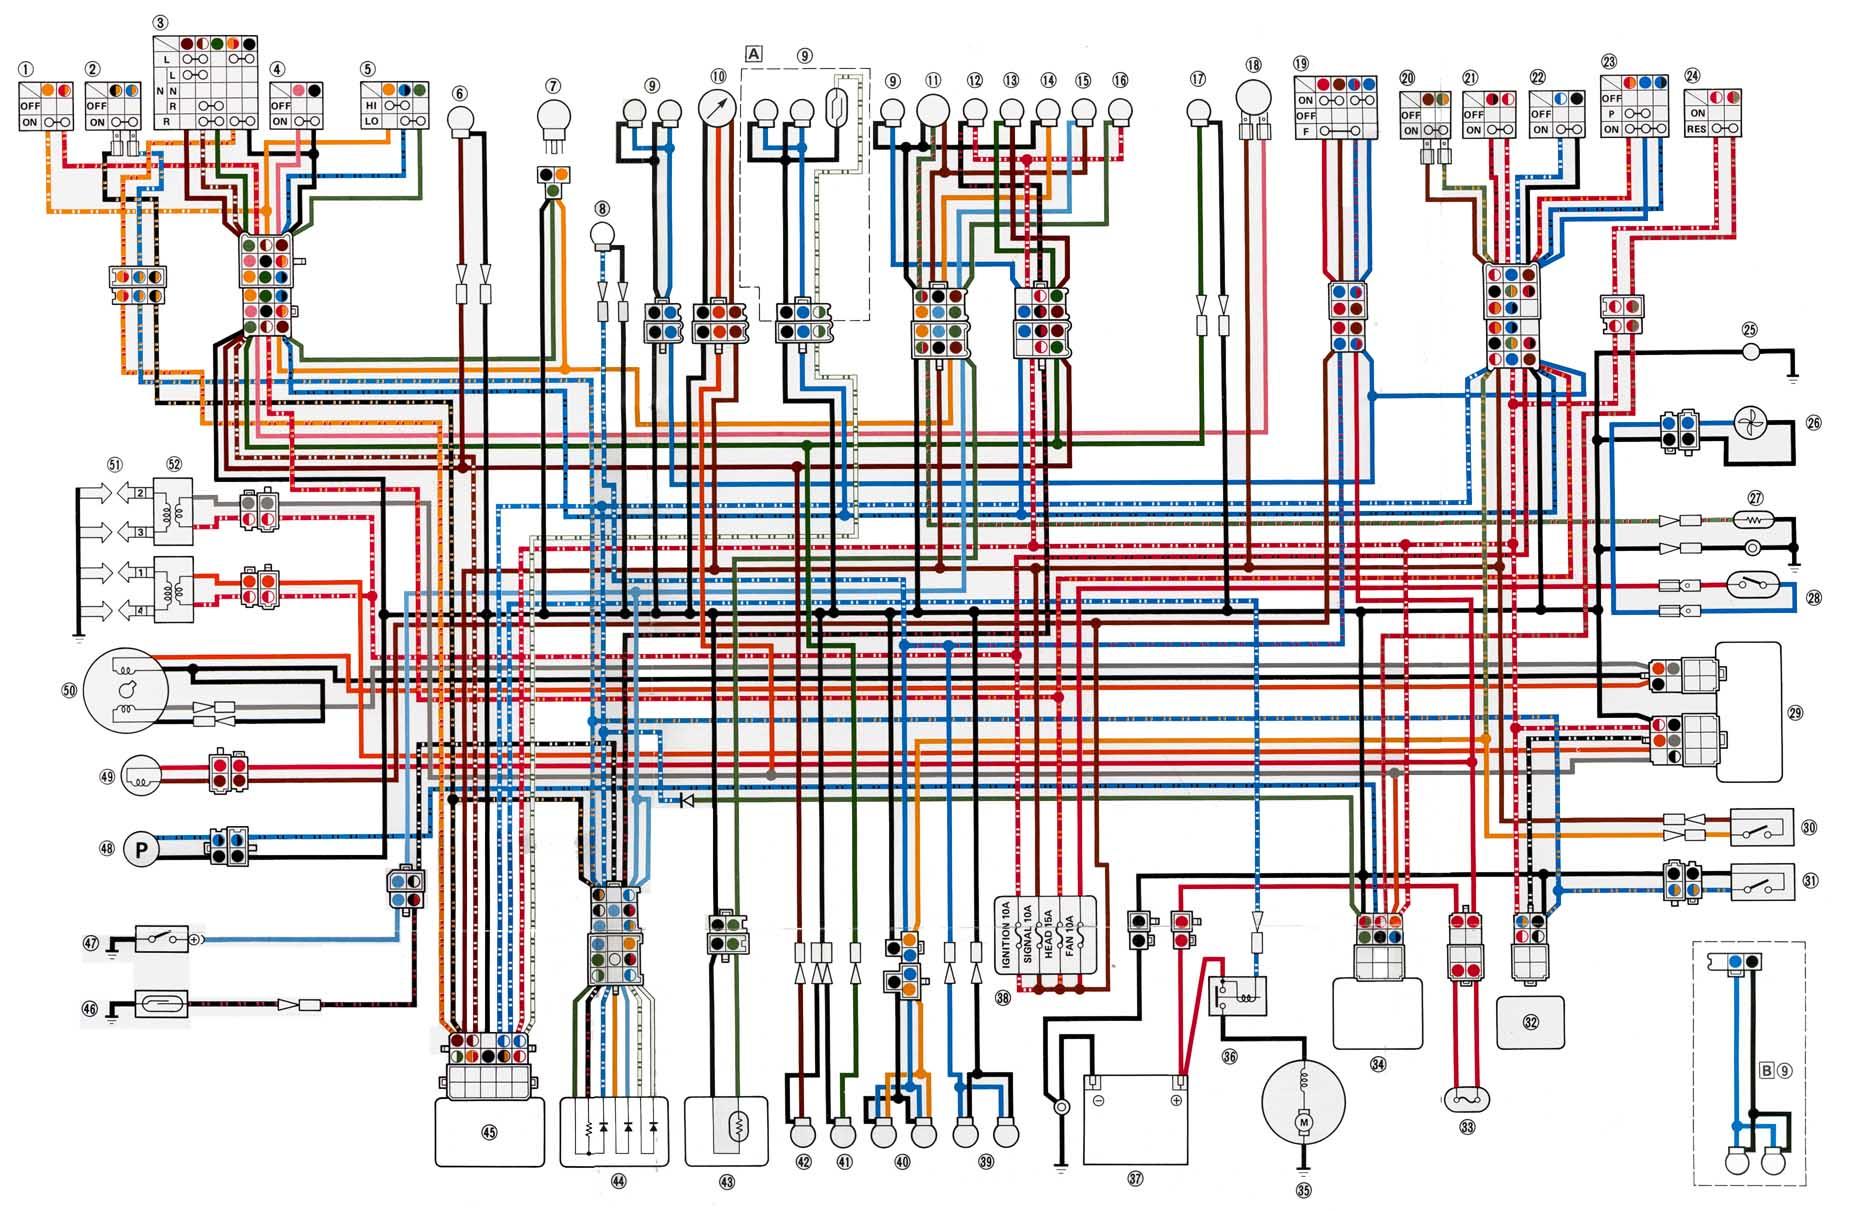 an_3886] yamaha sz wiring diagram 2014 yamaha fz6 wiring diagram yamaha fz 150 wiring diagram lexor indi exmet inst piot cali xeira mohammedshrine librar wiring 101